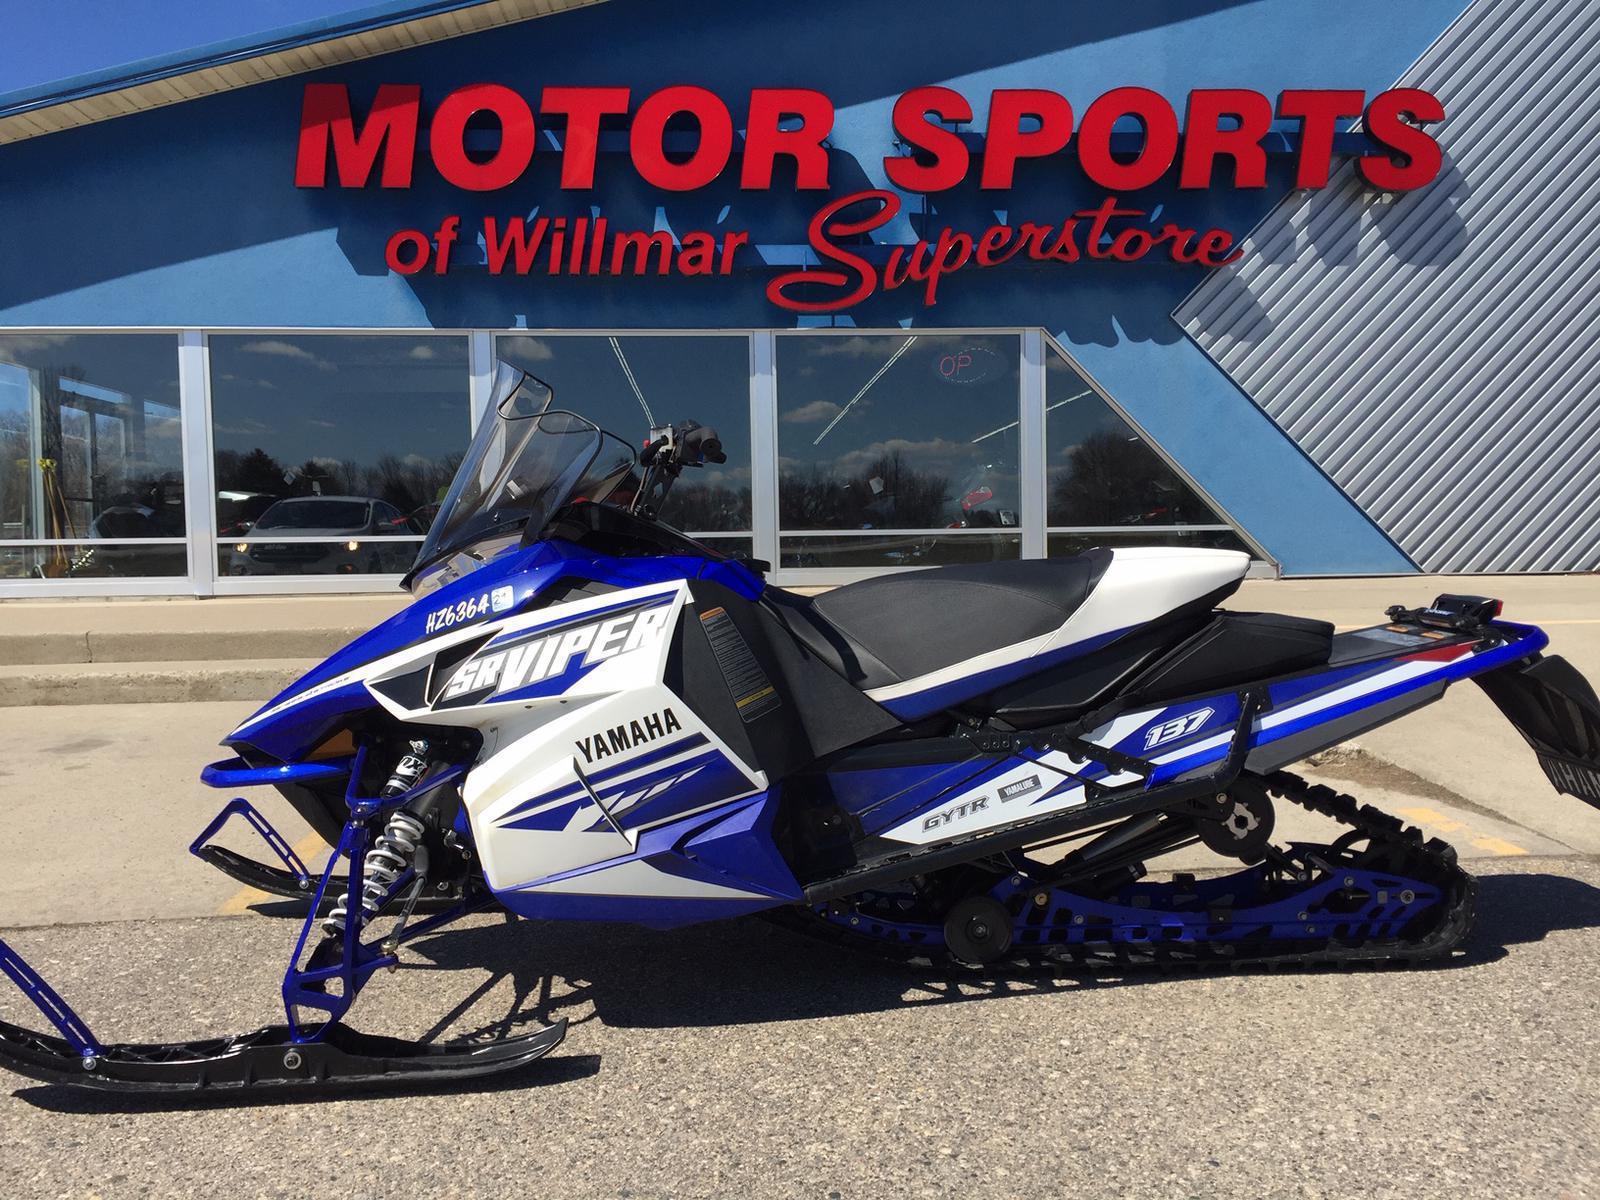 Inventory Motor Sports of Willmar Willmar, MN (800) 205-7188